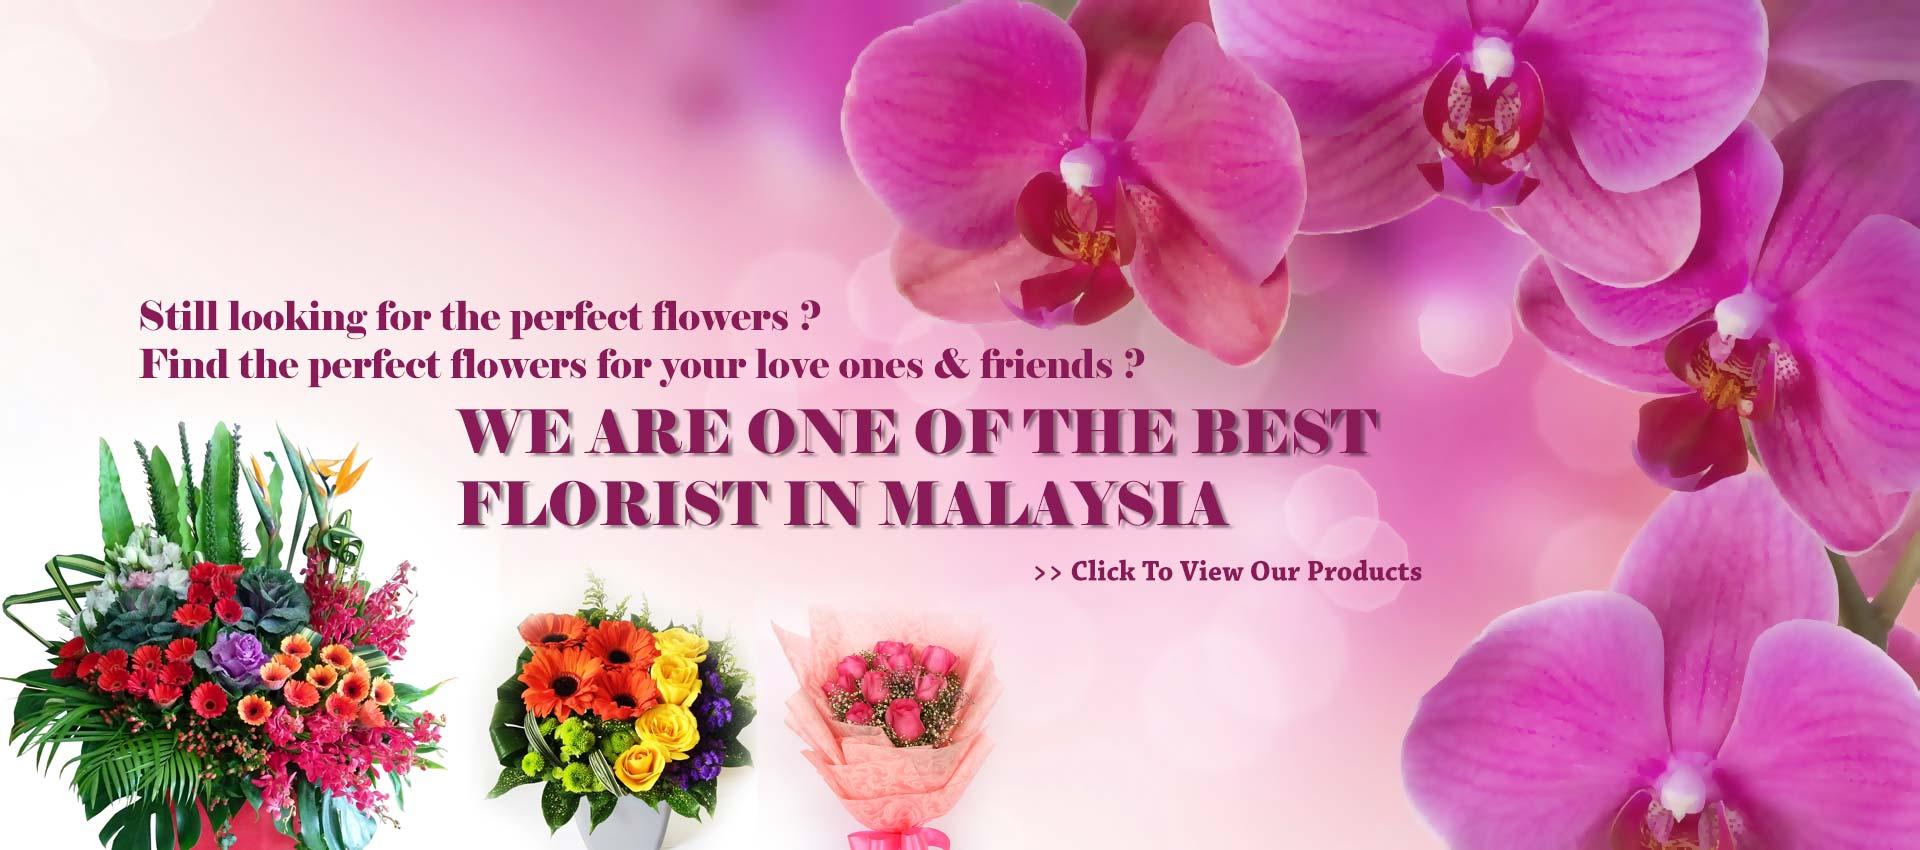 Myflowerflorist.com | Best Online in Malaysia | Online Flower Delivery Malaysia | Florist Malaysia